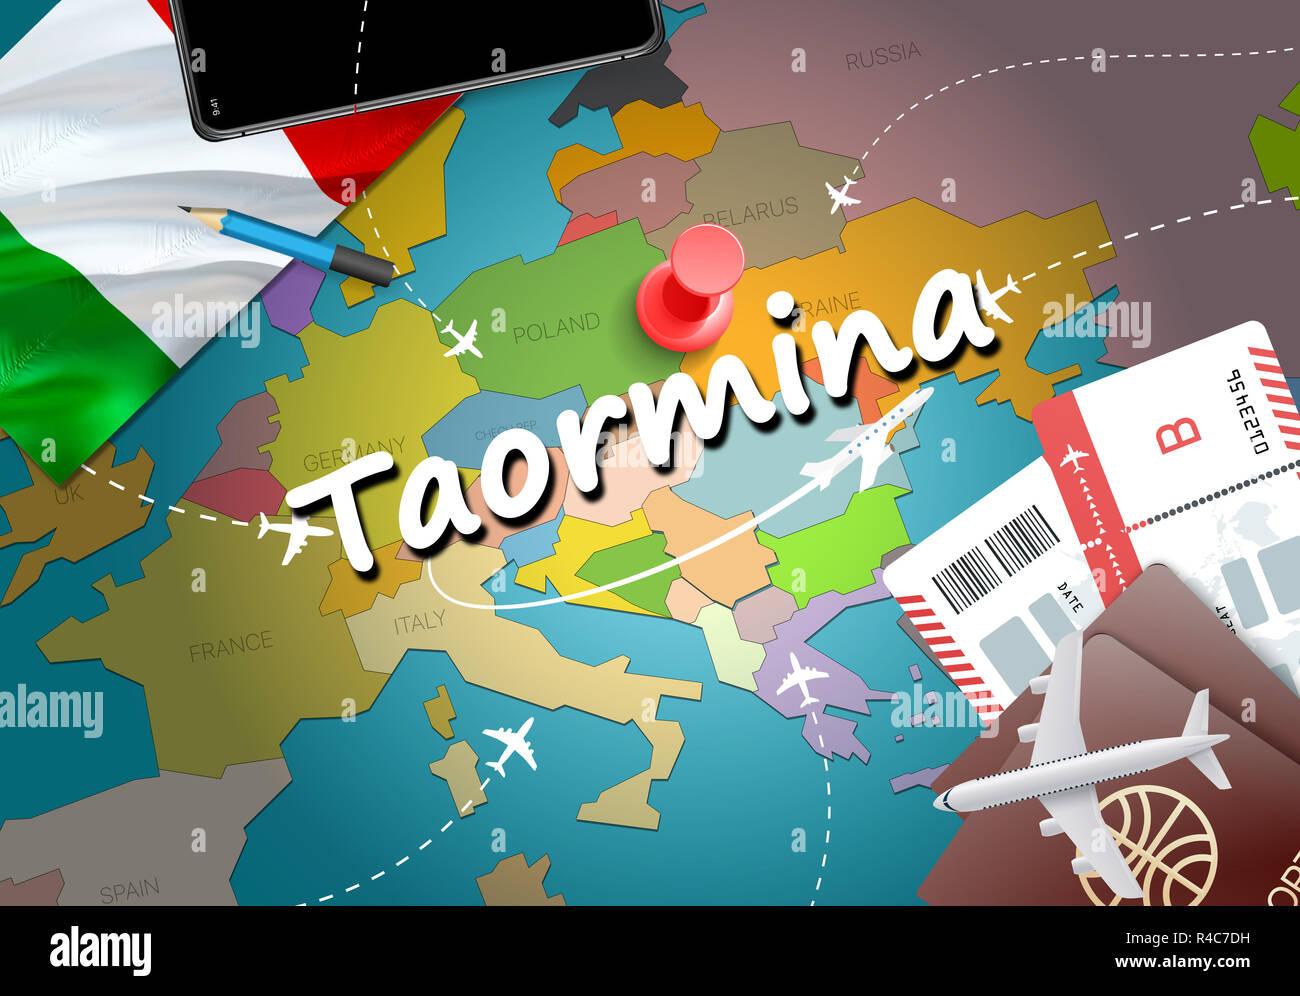 Taormina City Travel And Tourism Destination Concept Italy Flag And